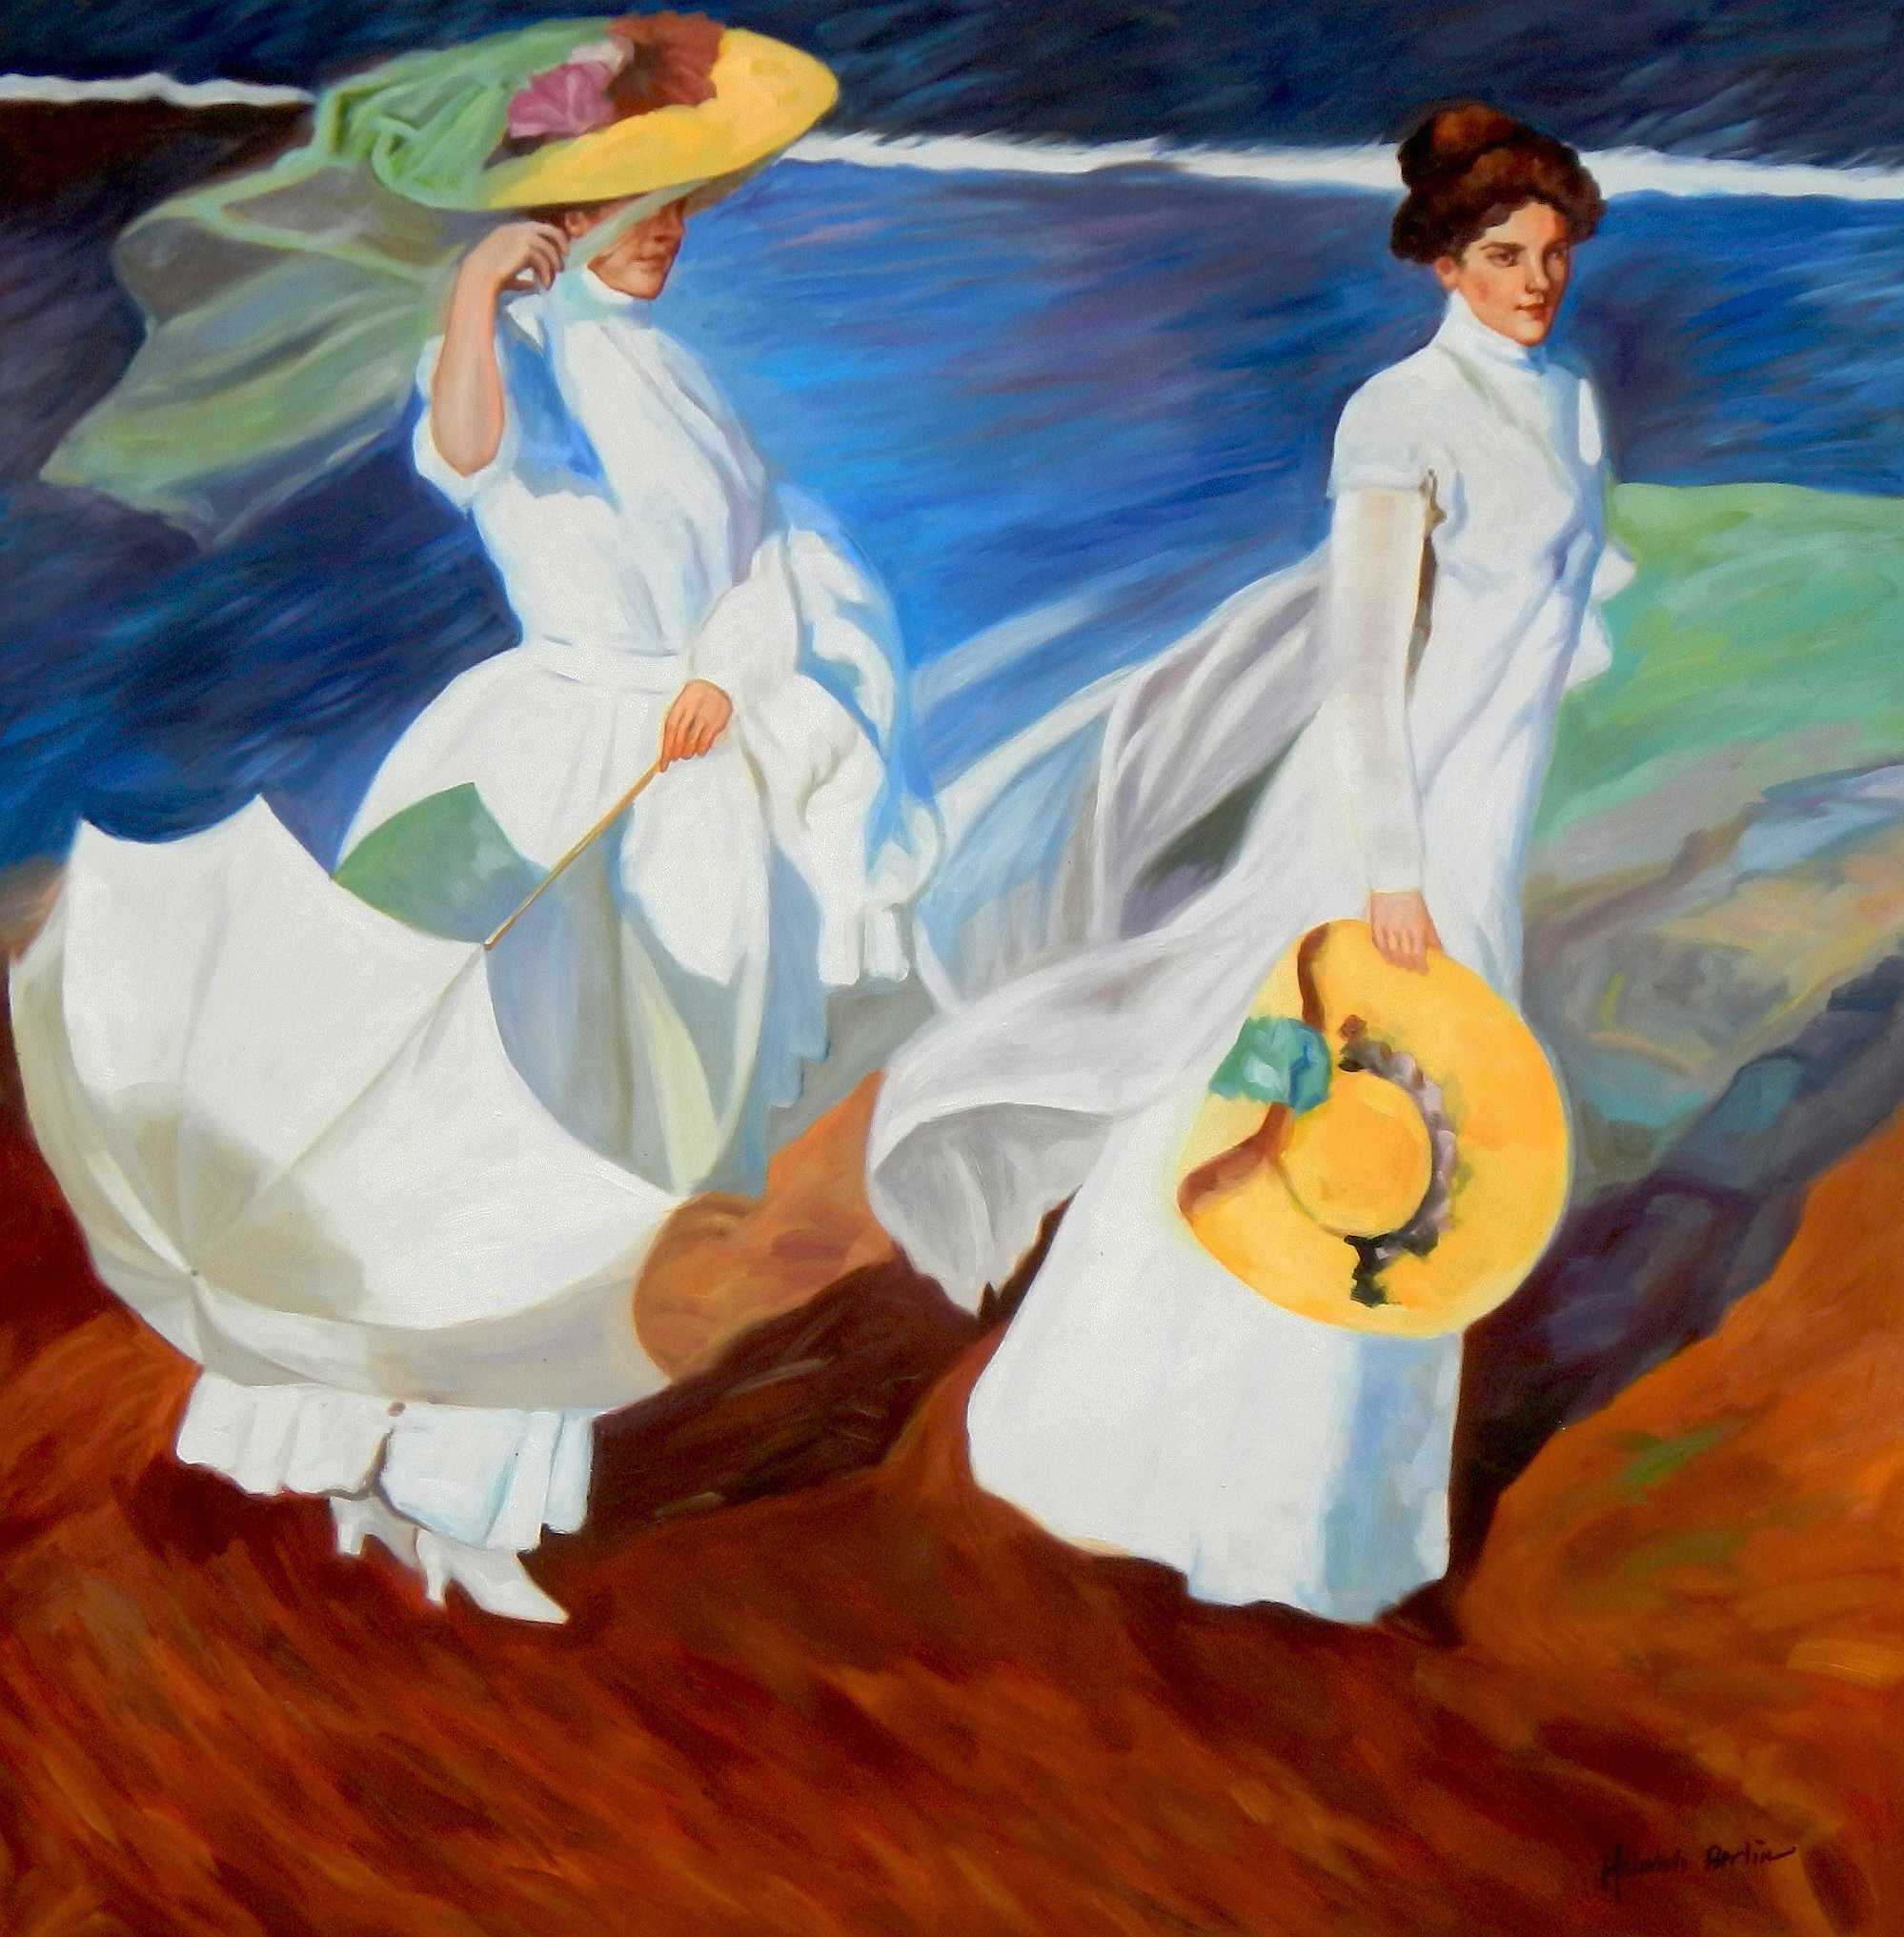 Joaquín Sorolla - Strandspaziergang m95317 120x120cm exquisites Gemälde